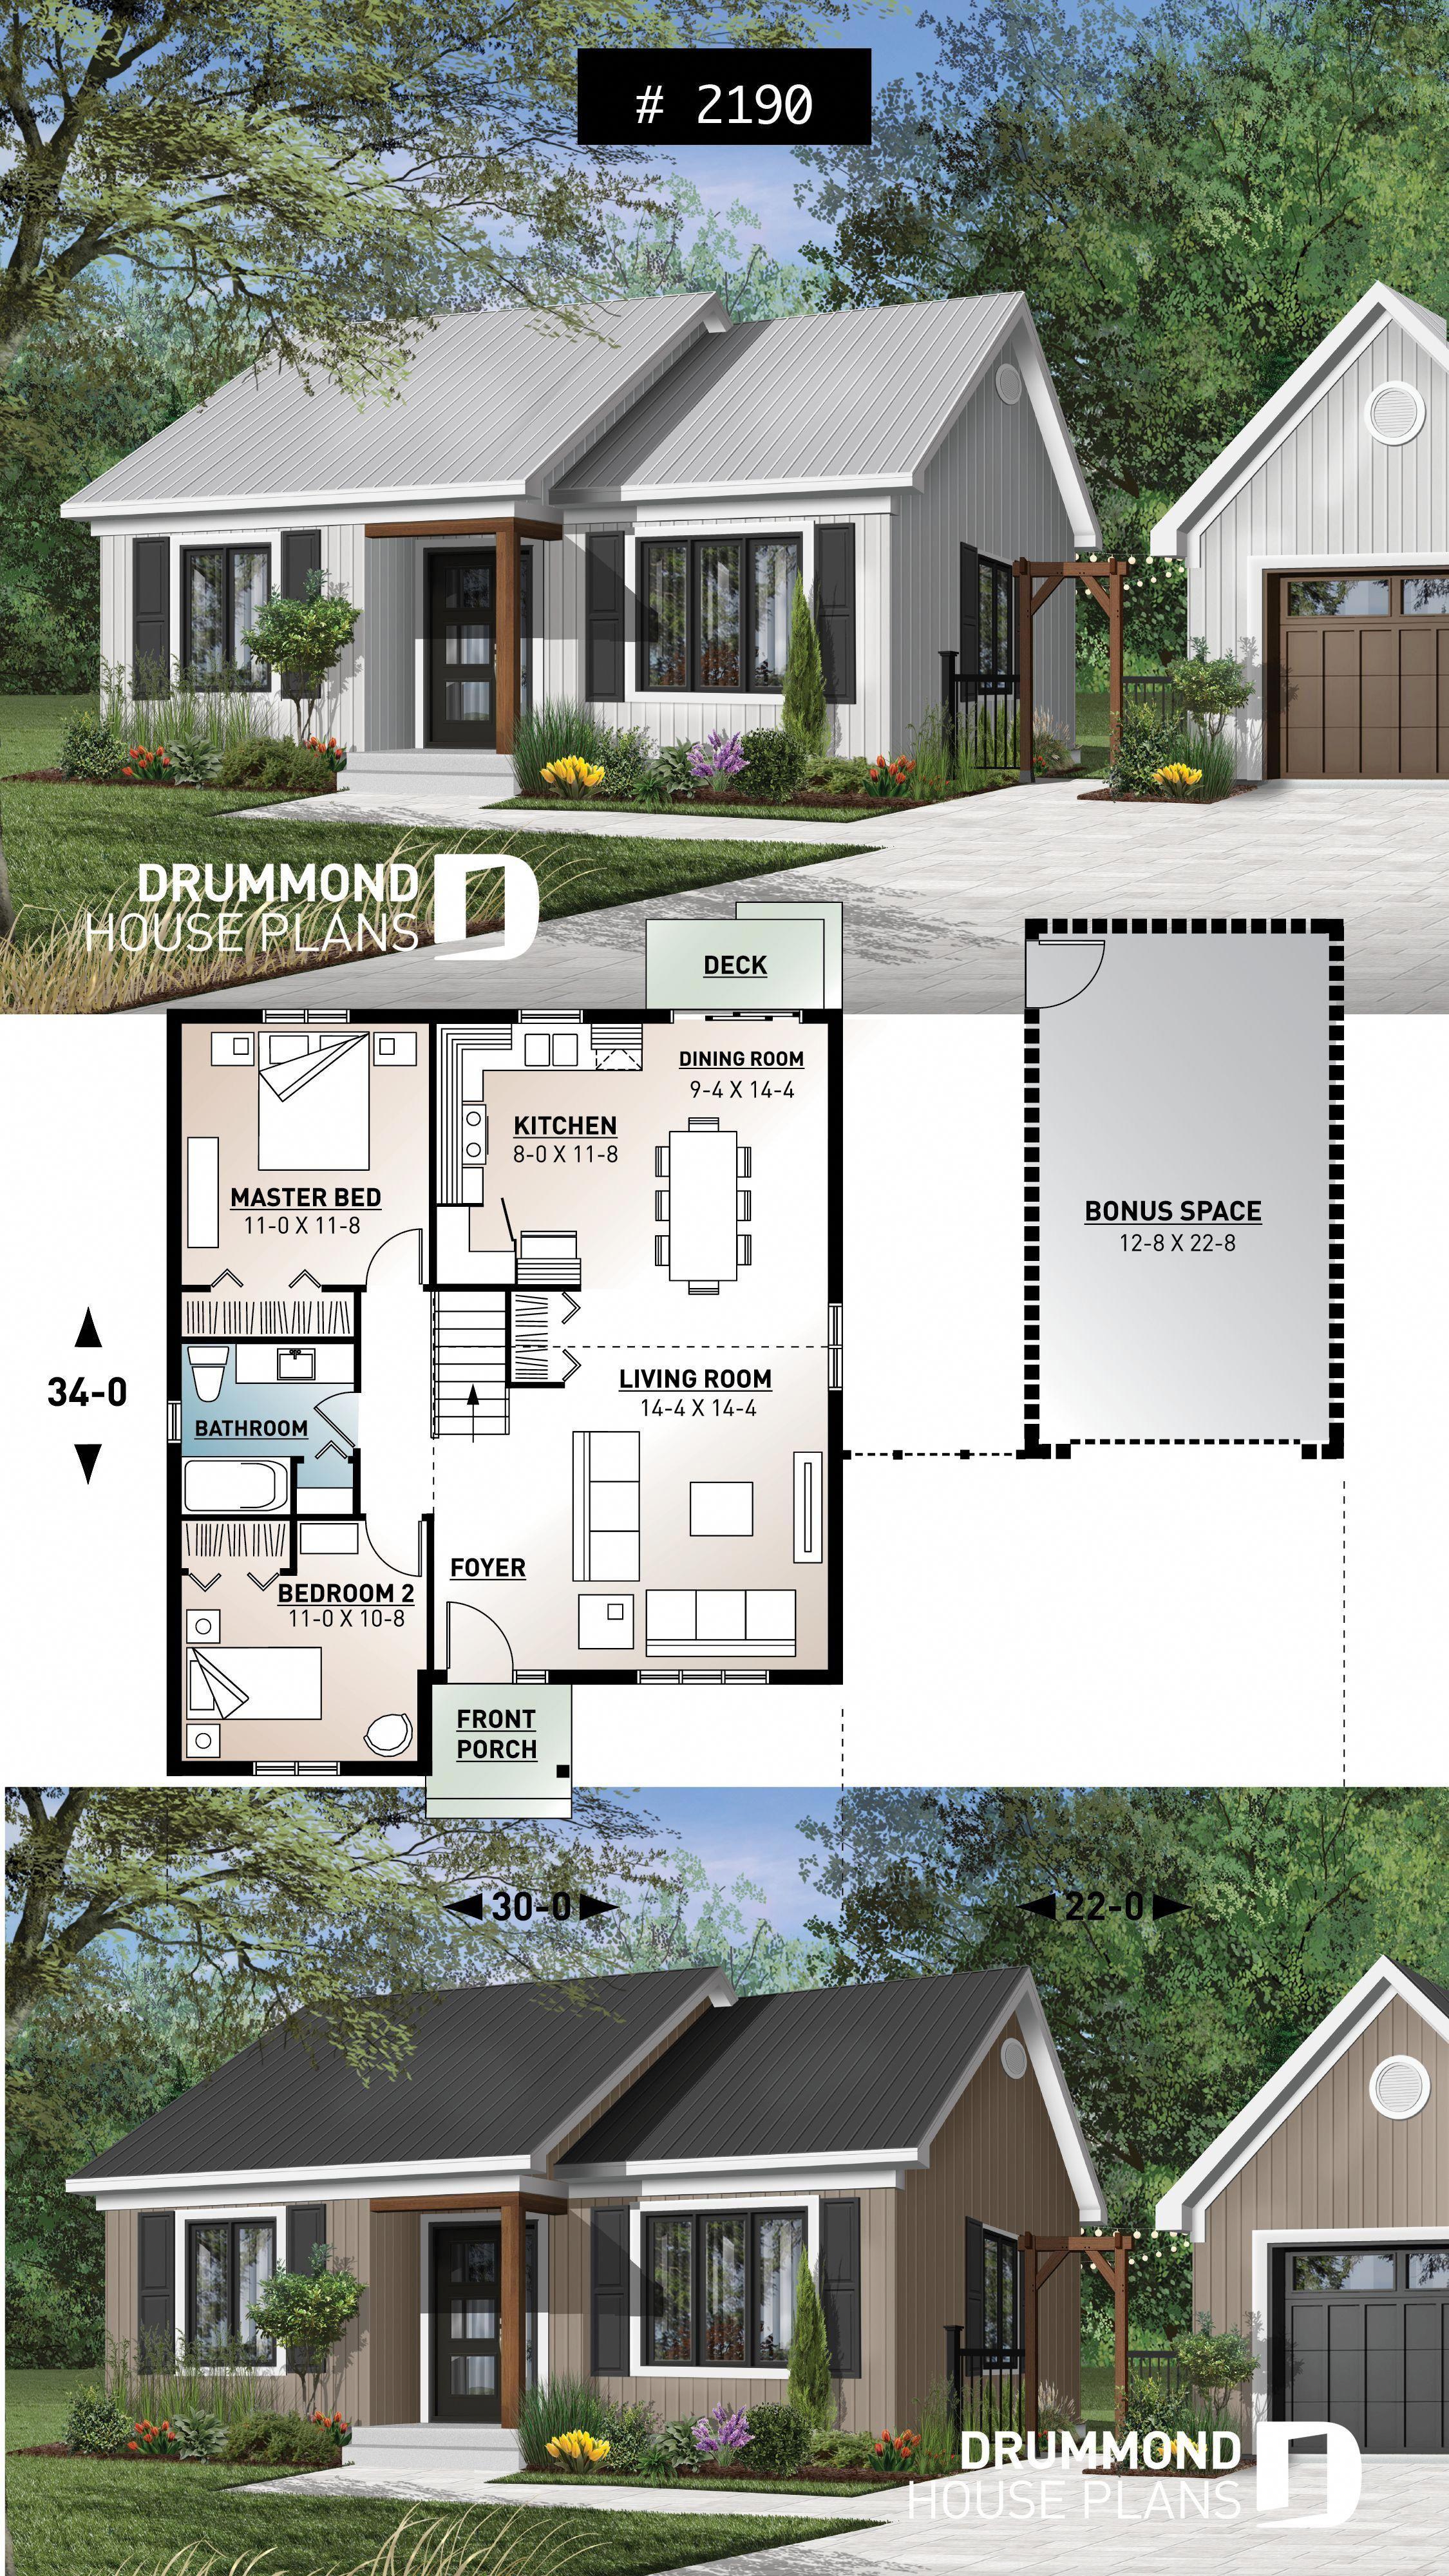 Low Budget Home Decoration Ideas Interiordesignsoftware Drummond House Plans House Plans Architecture House